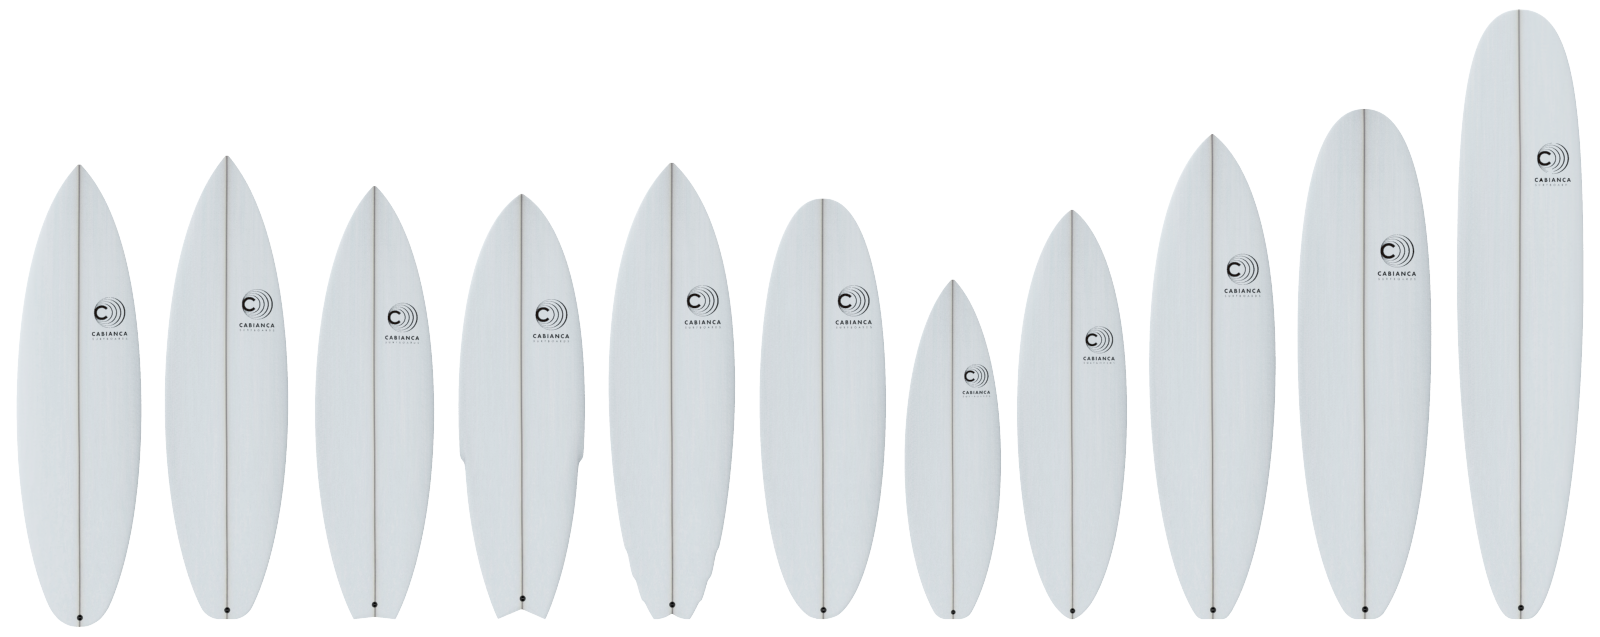 Cabianca Surfboards webshop coming soon